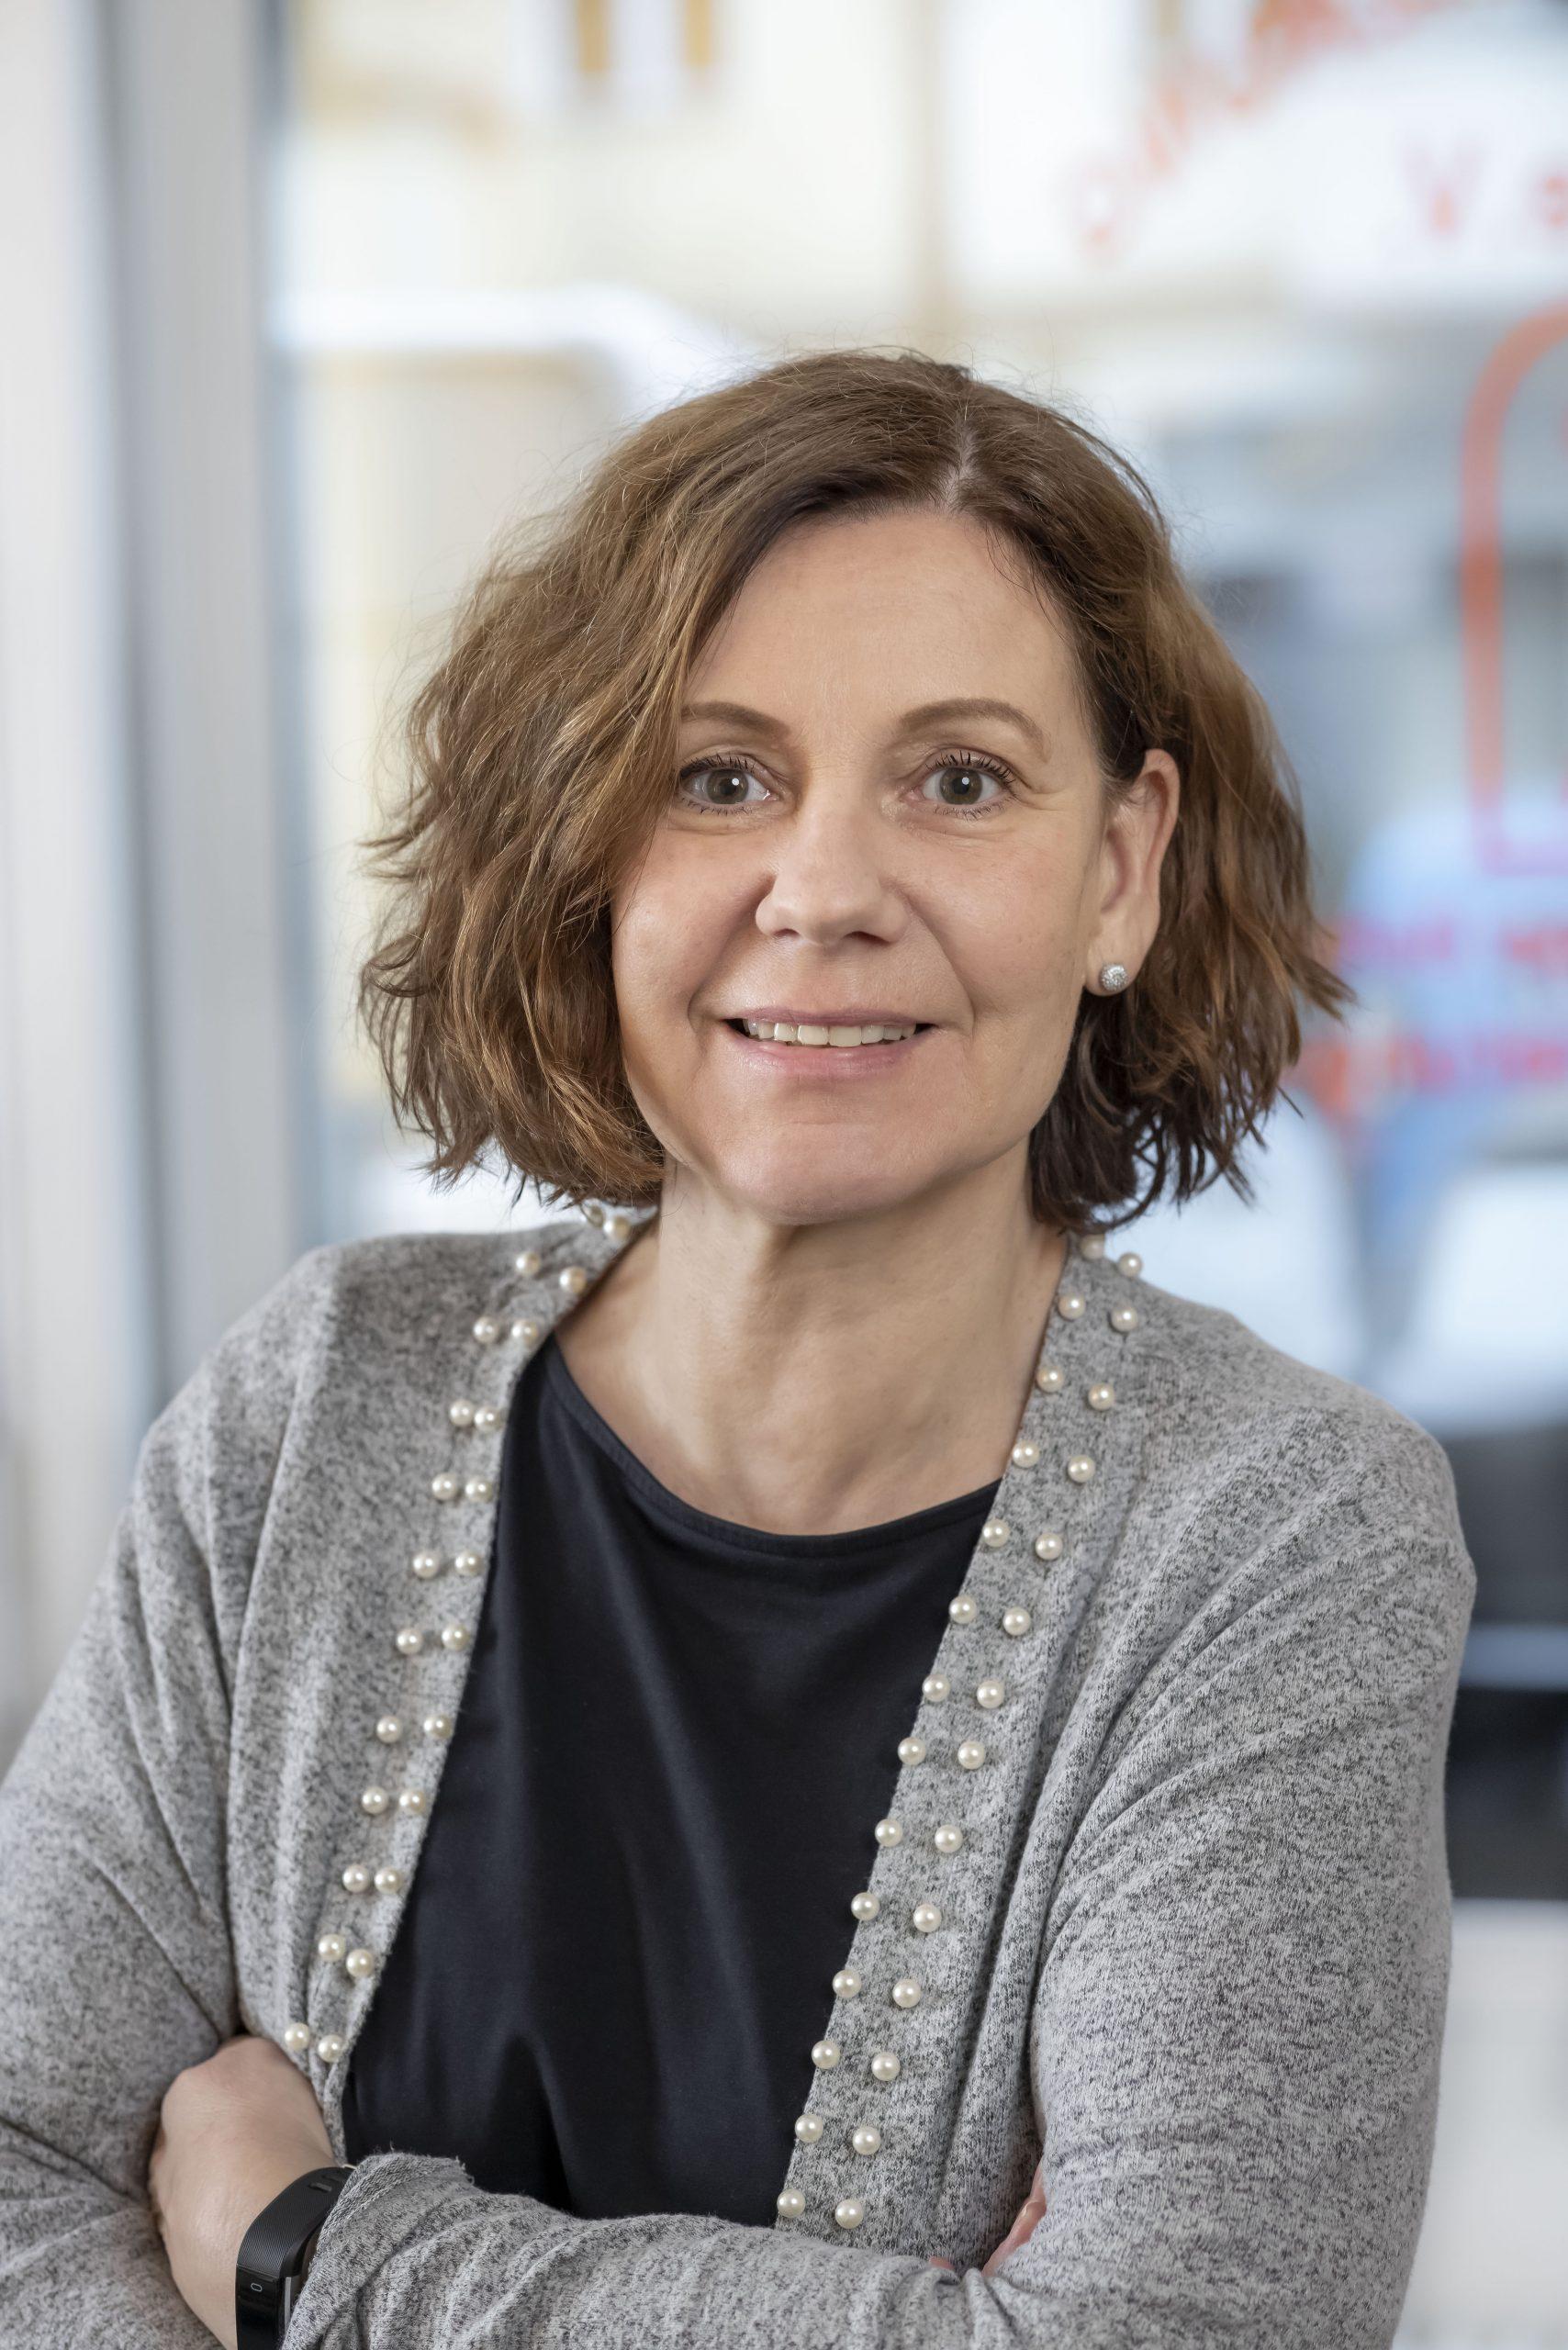 Katja Lalk, Assistentin der Geschäftsführung